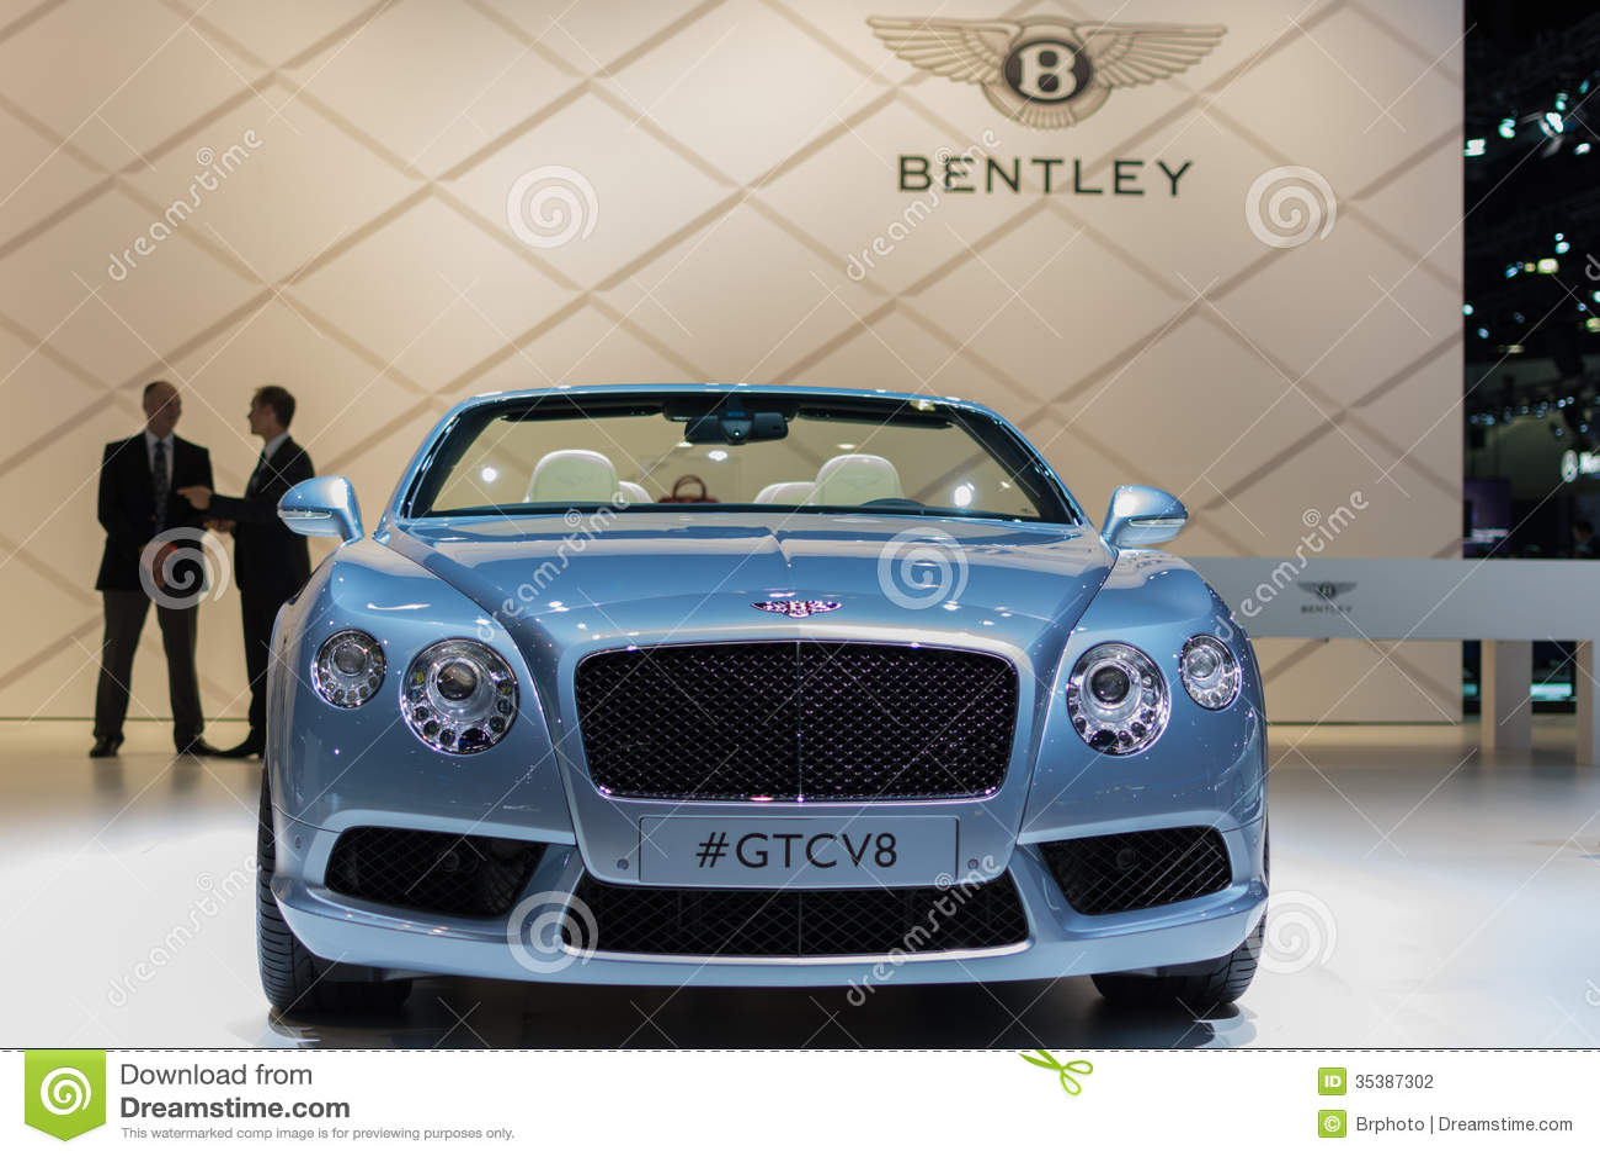 bentley gtcv8 car on display at the la auto show. Black Bedroom Furniture Sets. Home Design Ideas